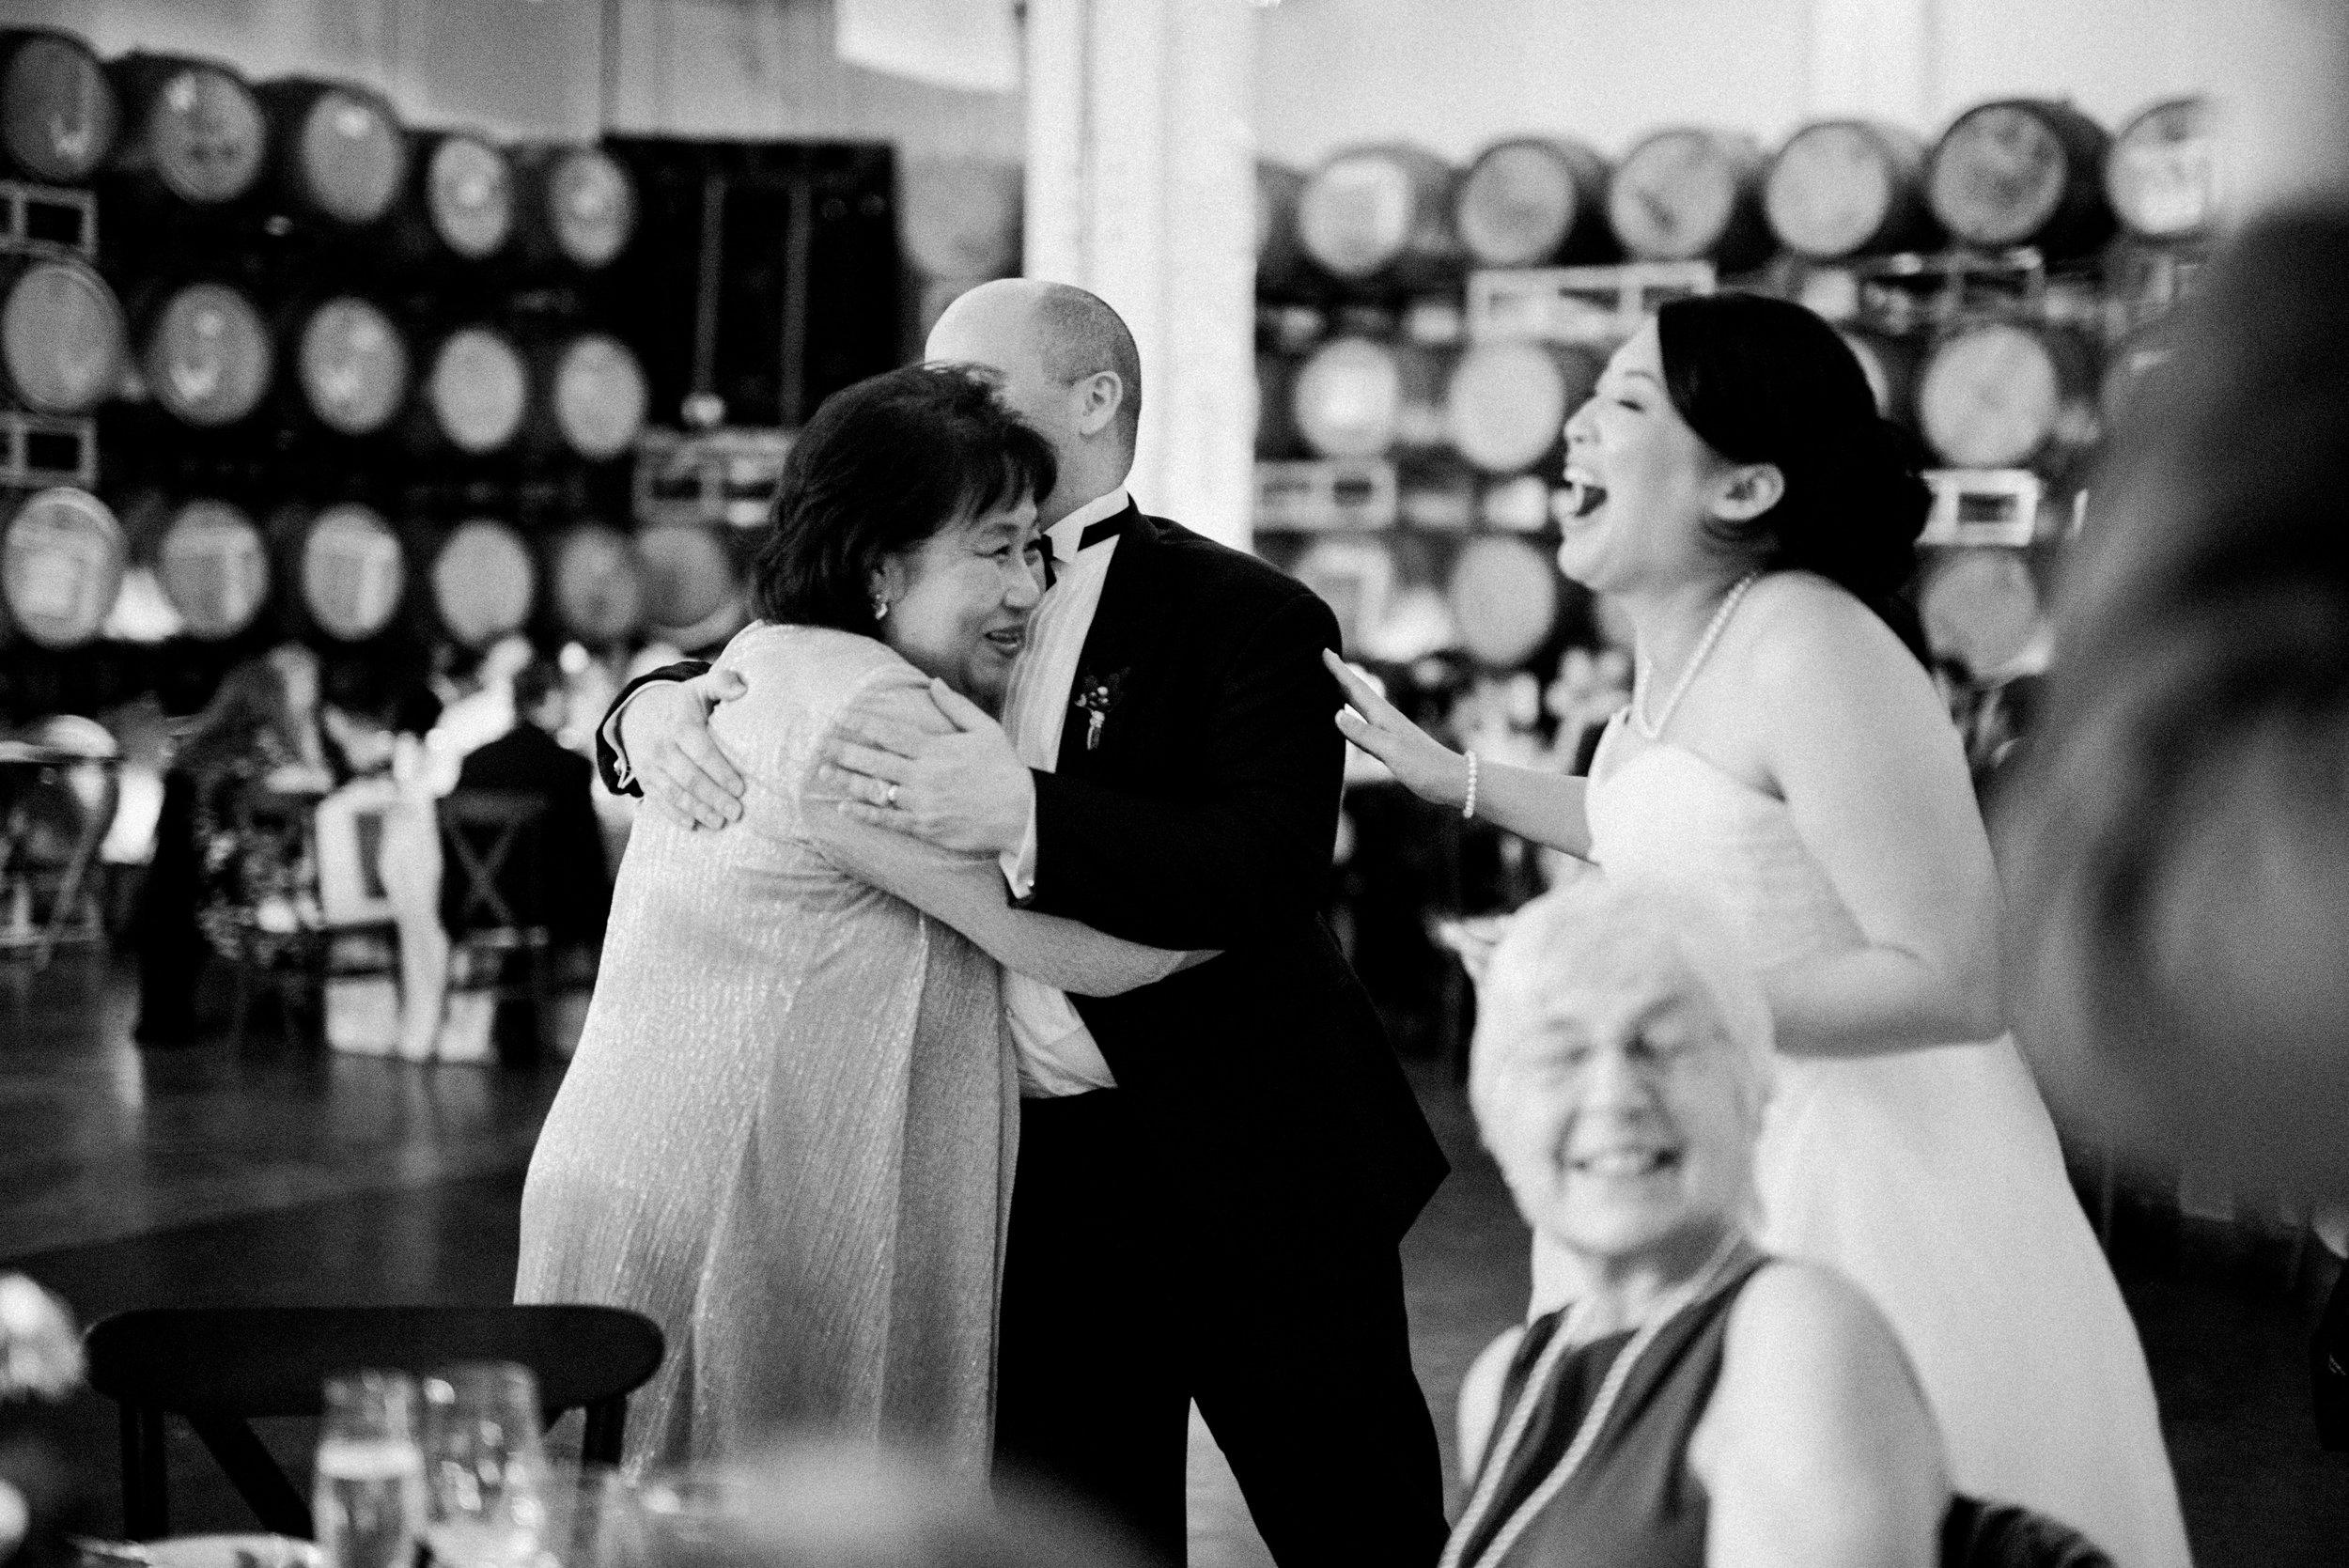 Swedenborgian Church Dogpatch Winery Wedding073.jpg